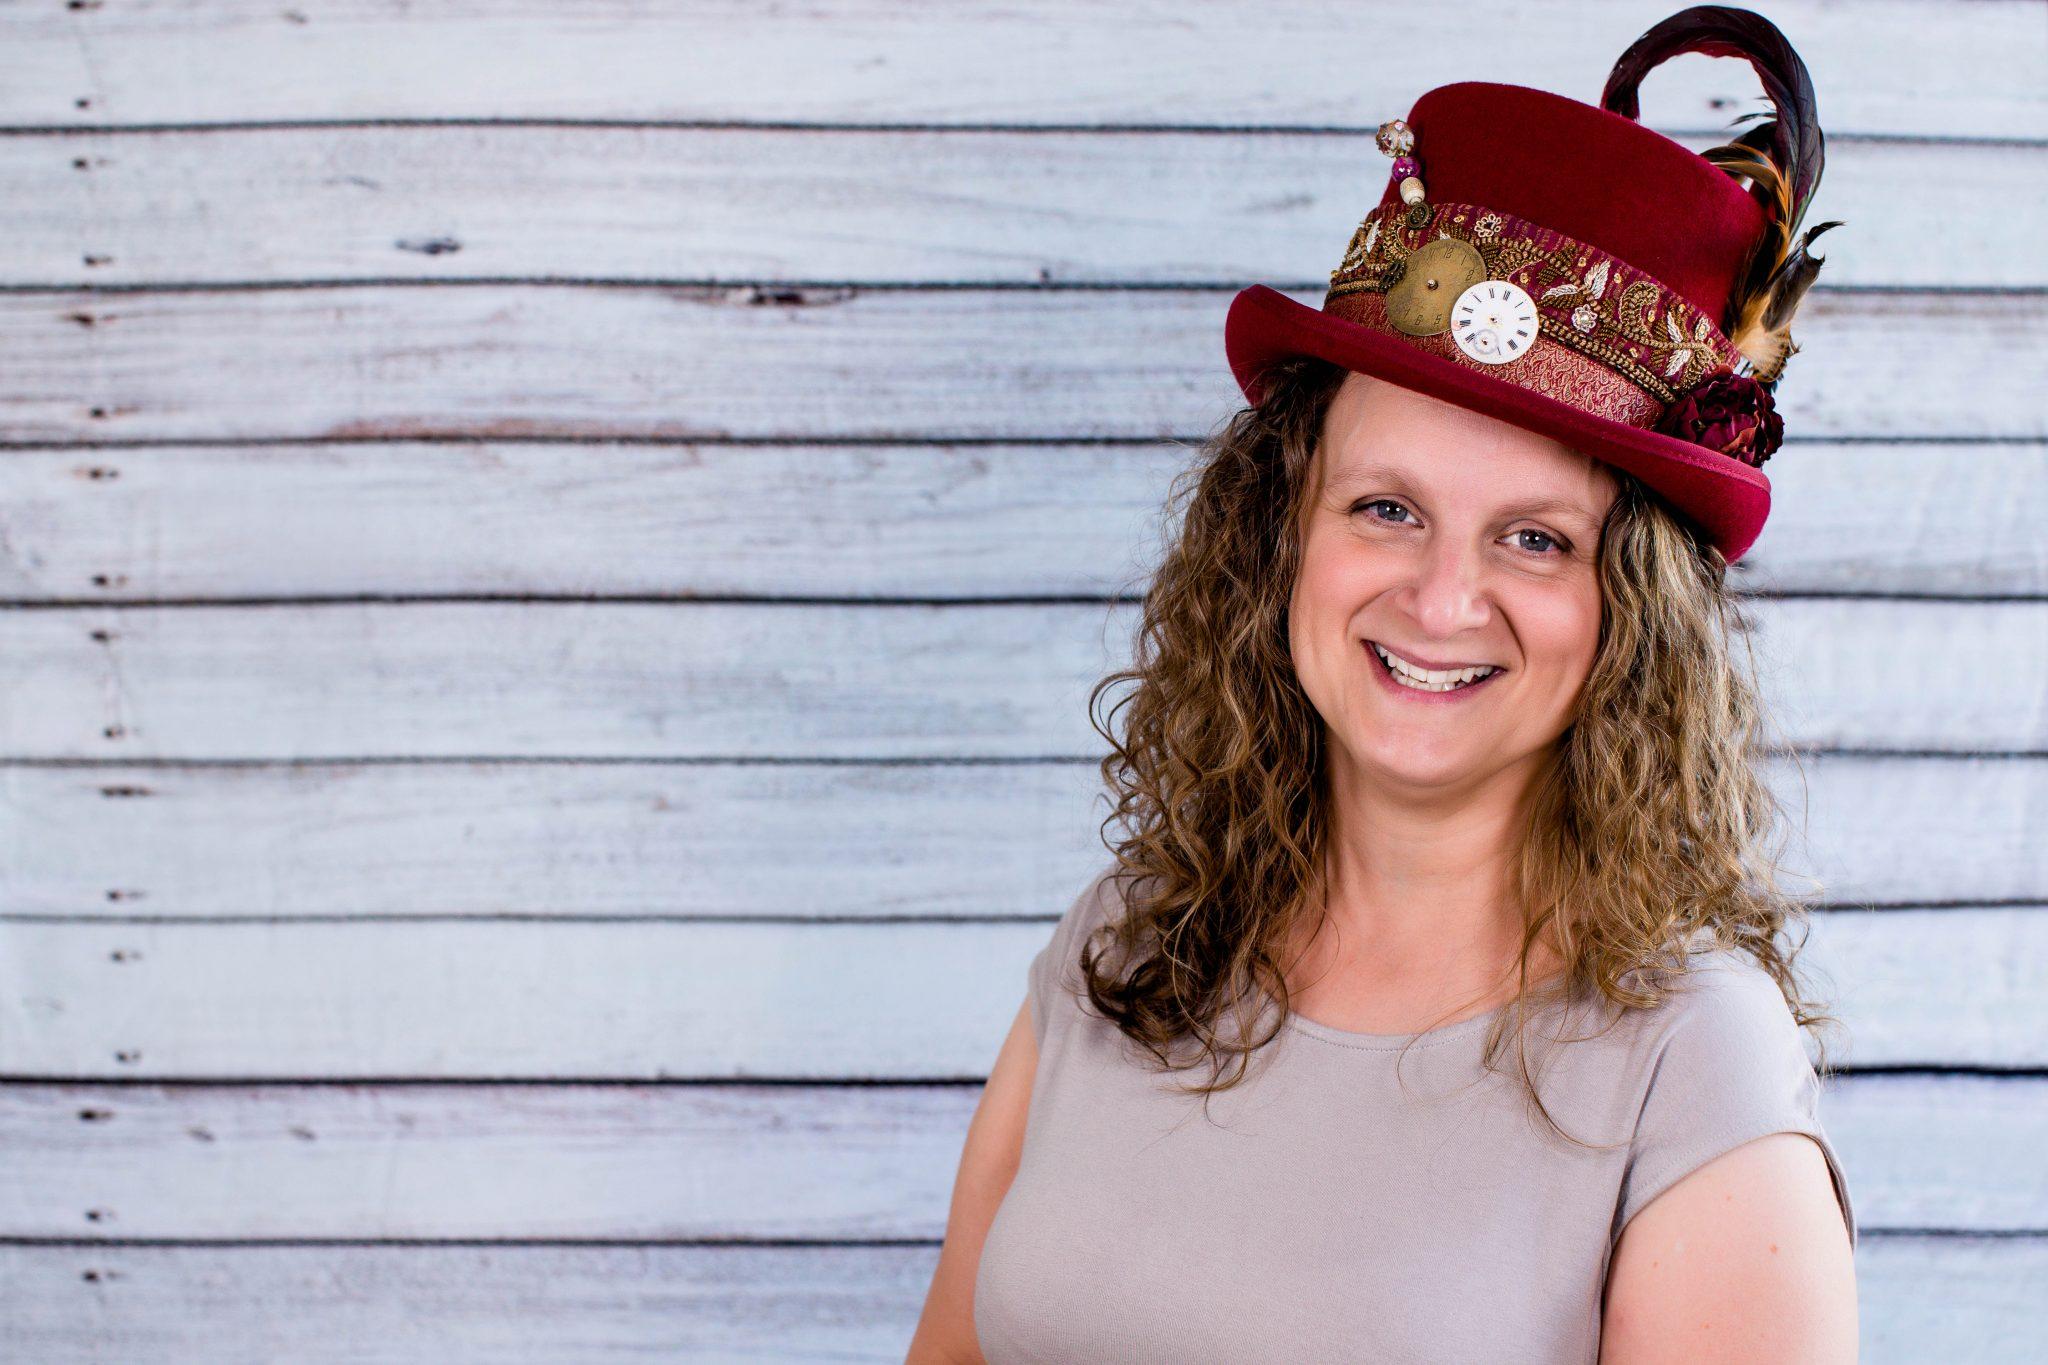 female wearing jaunty hat